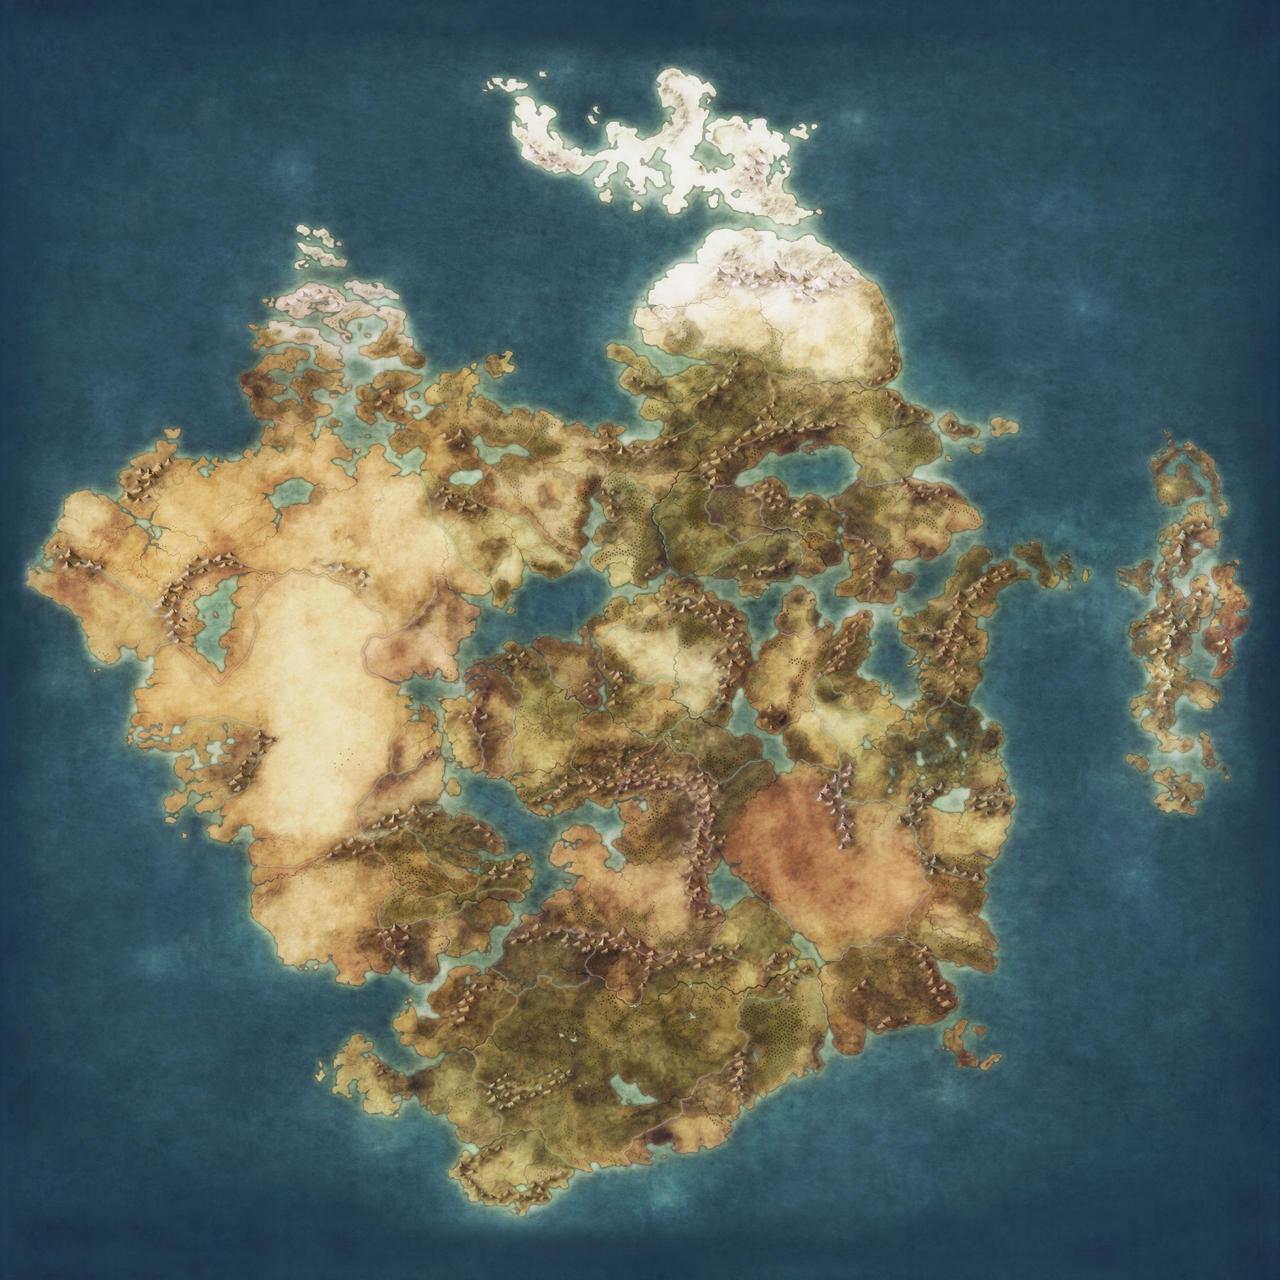 blank fantasy world map Blank Fantasy Map High Resolution By Quabbe On Deviantart blank fantasy world map